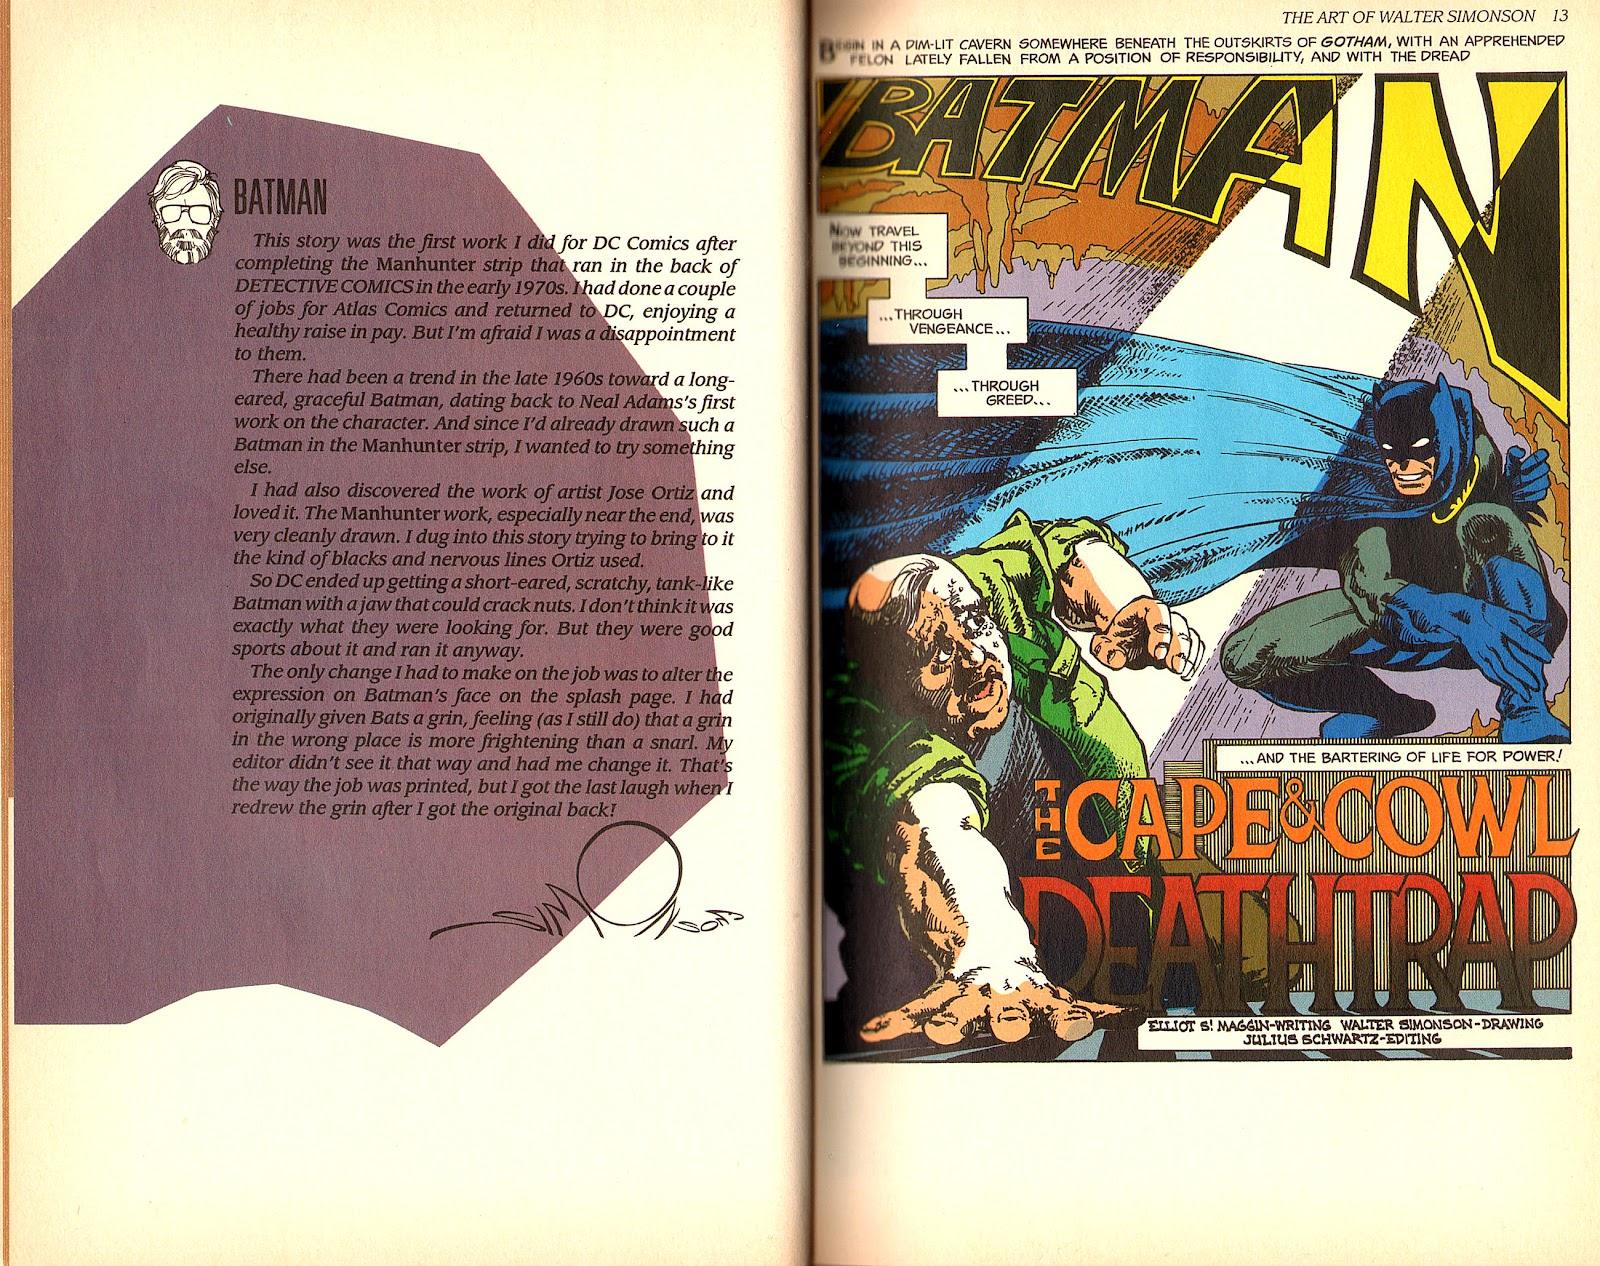 Read online The Art of Walter Simonson comic -  Issue # TPB - 8